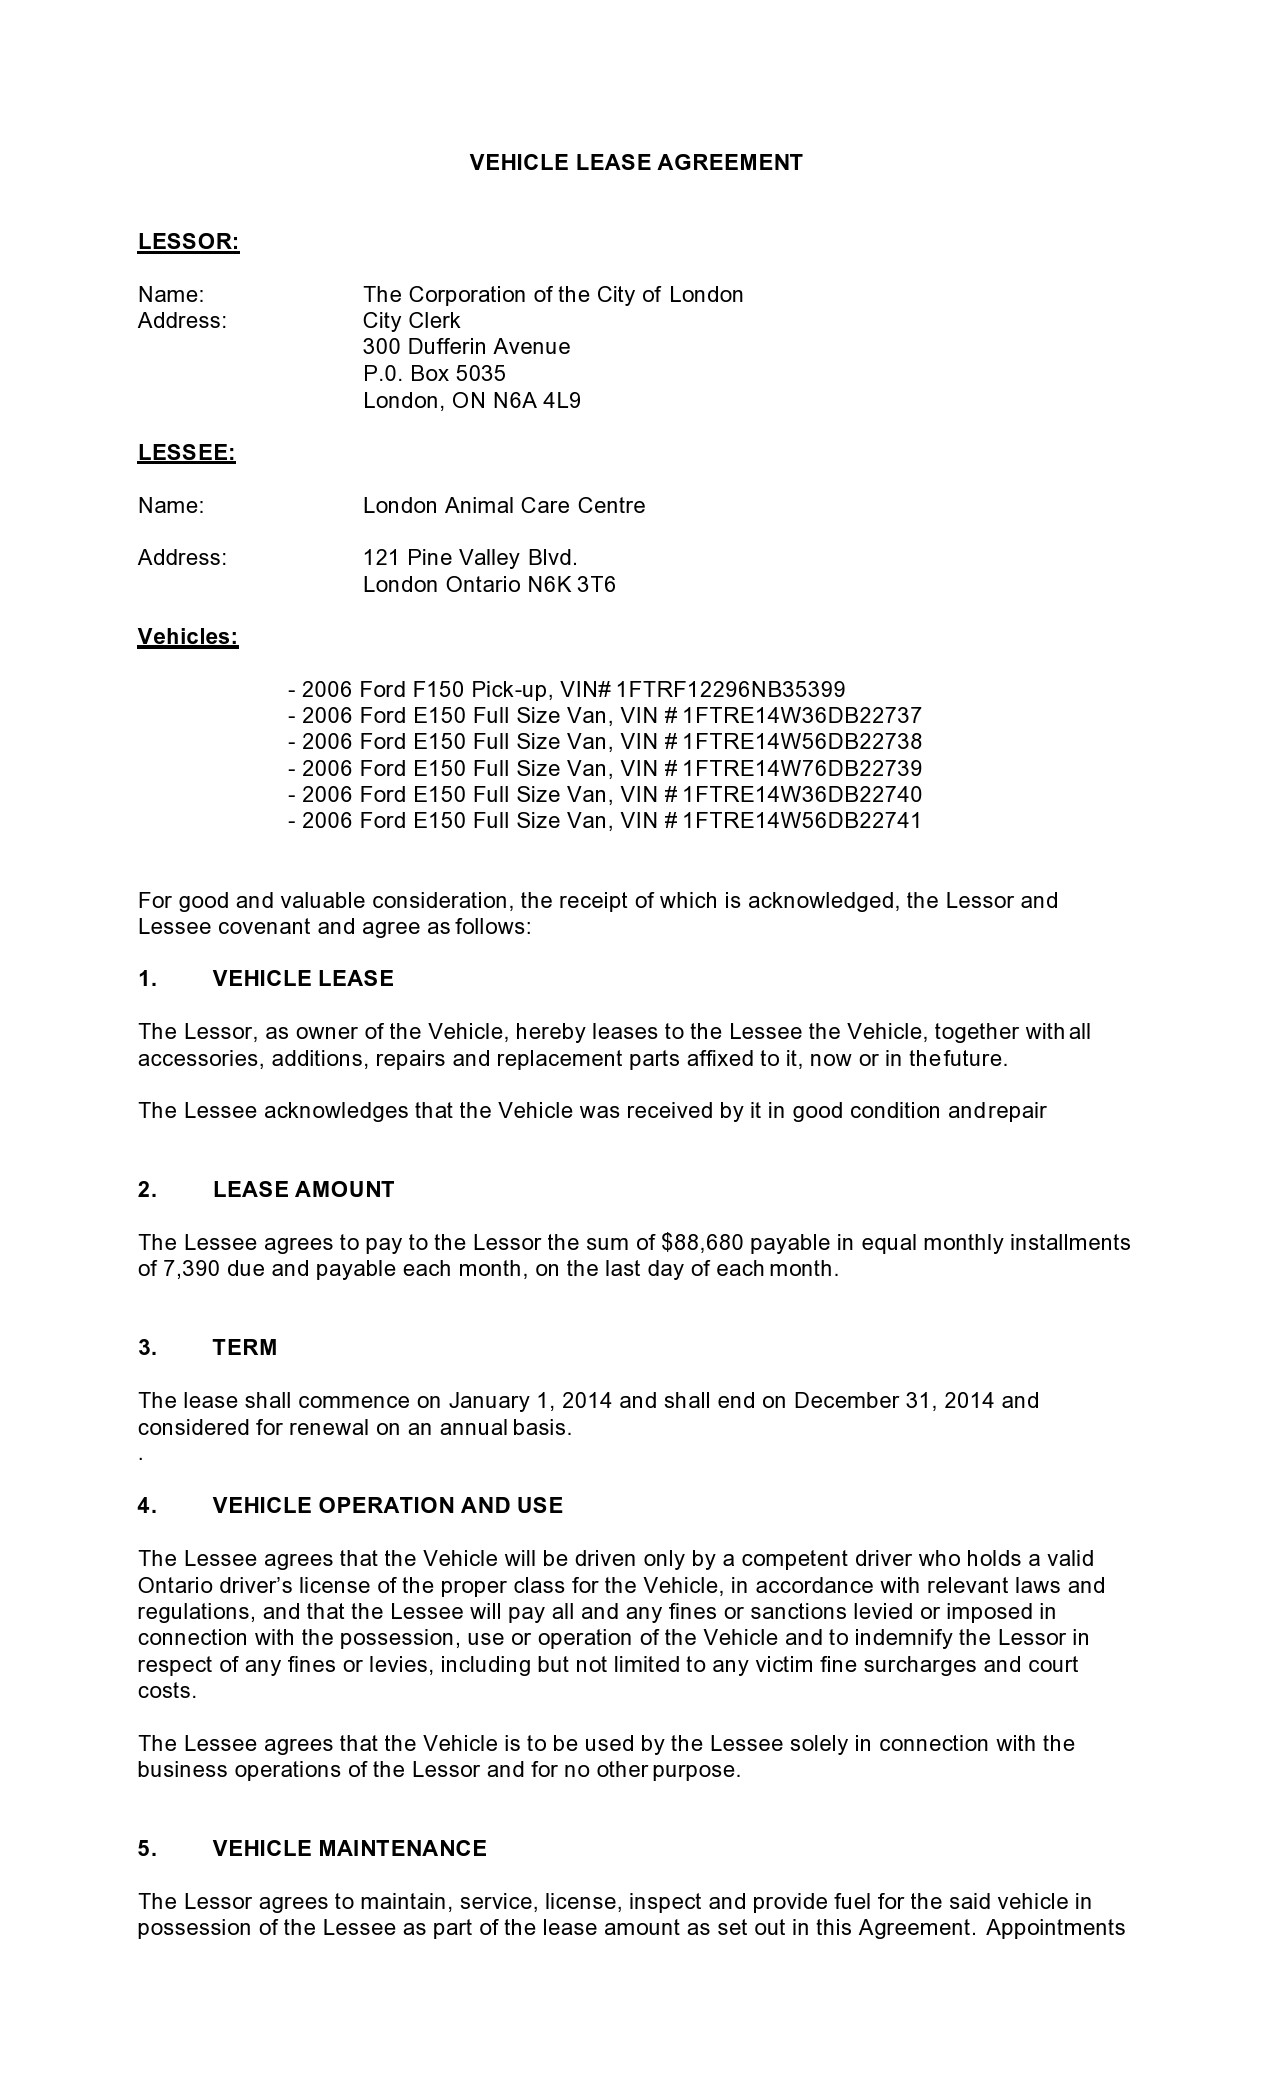 Free car rental agreement 27